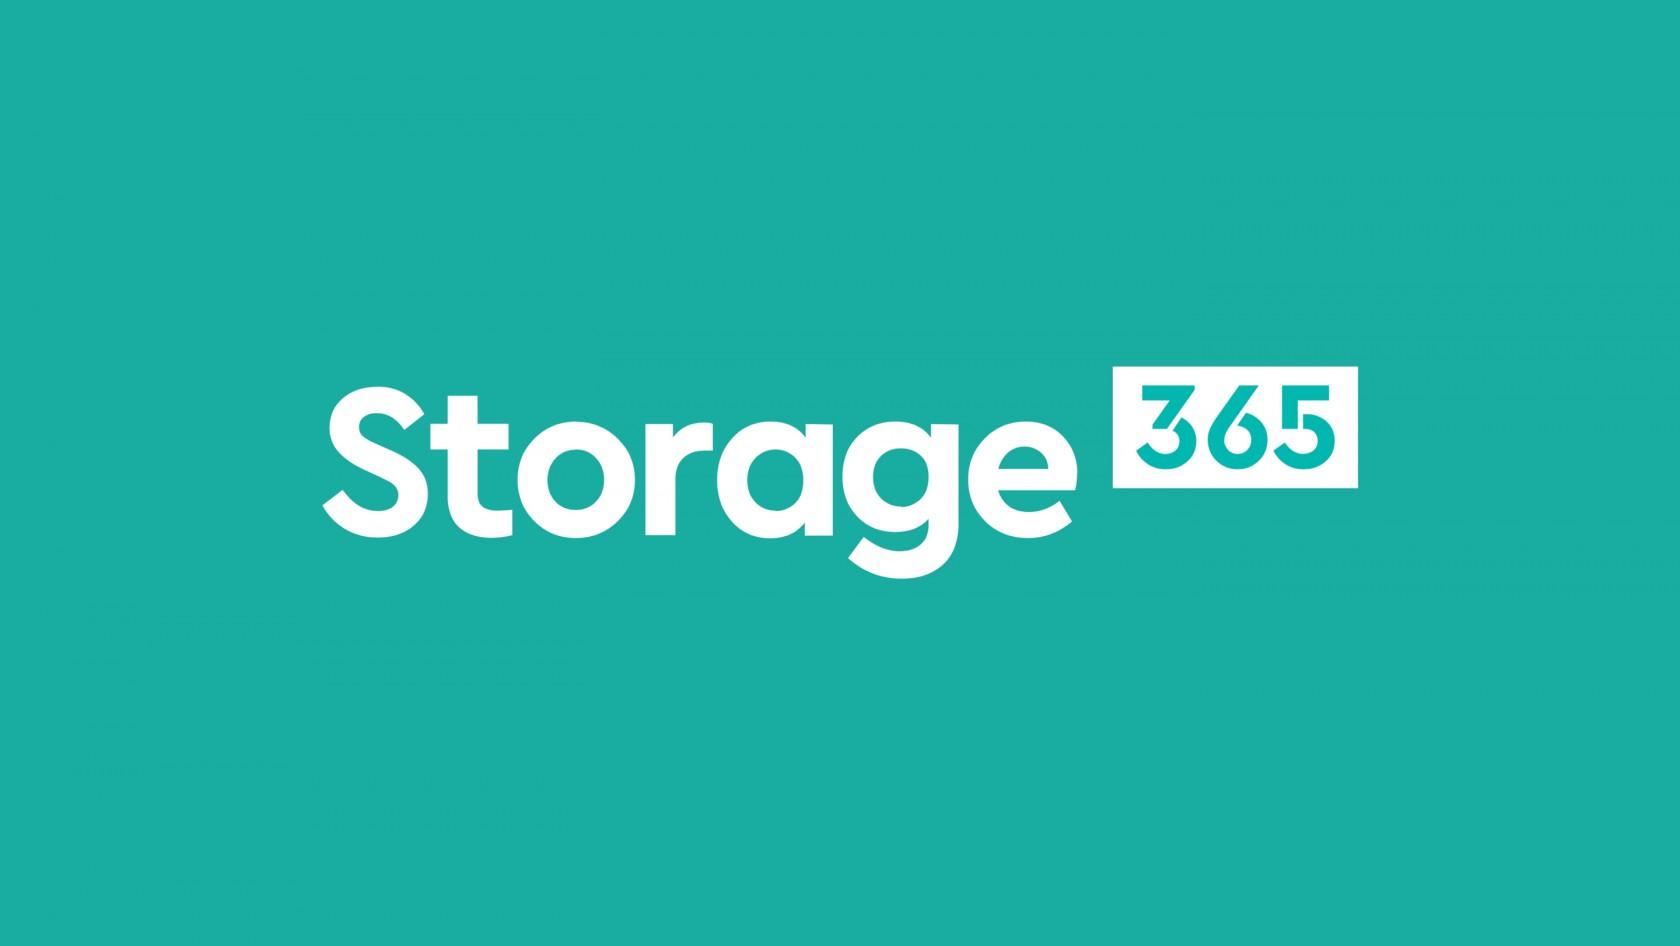 Storage 365 logo